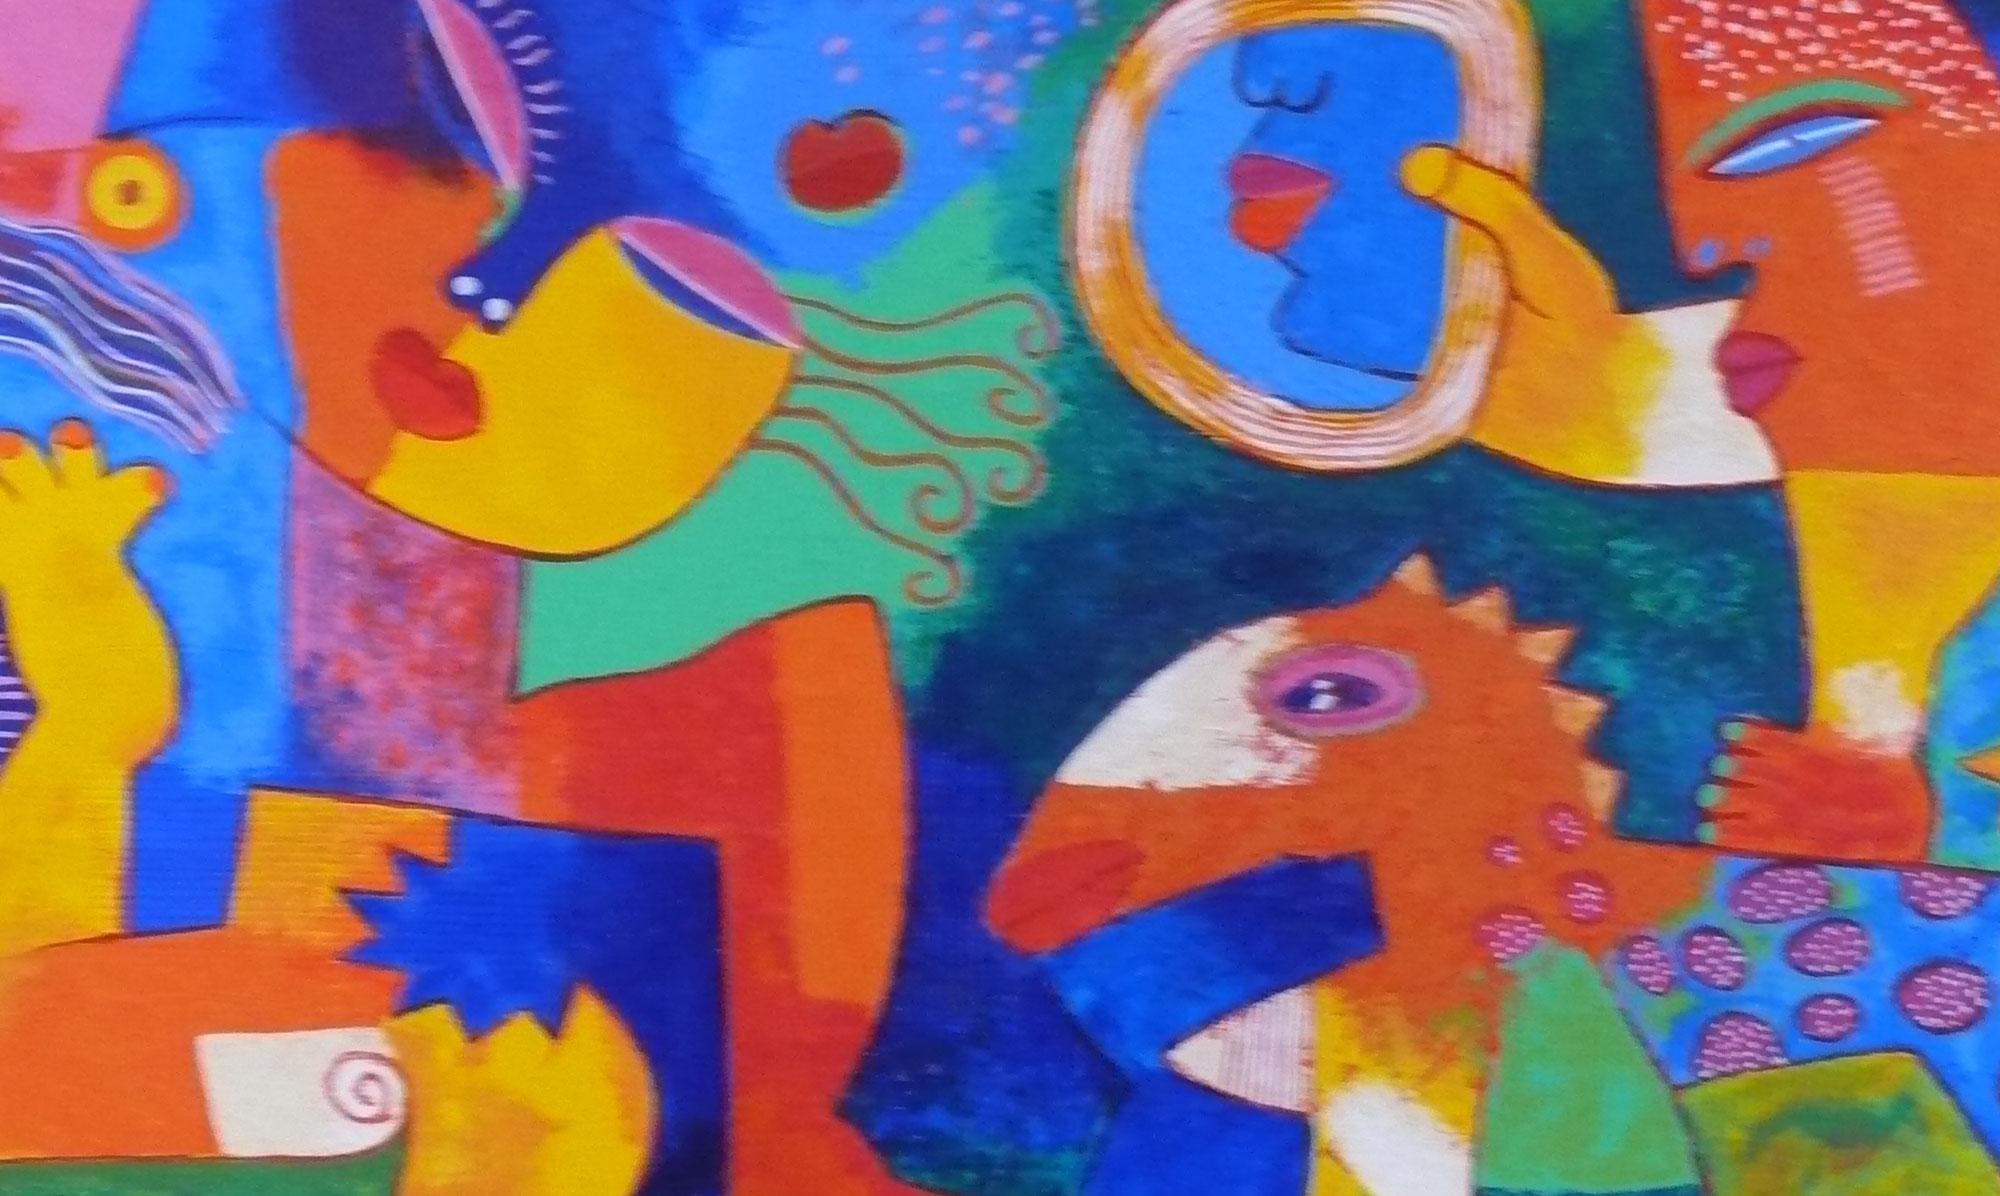 Vaak KUNSTWERKEN GERENOMMEERDE KUNSTENAARS - Pop-Up Galerie kunstwerken @WJ58